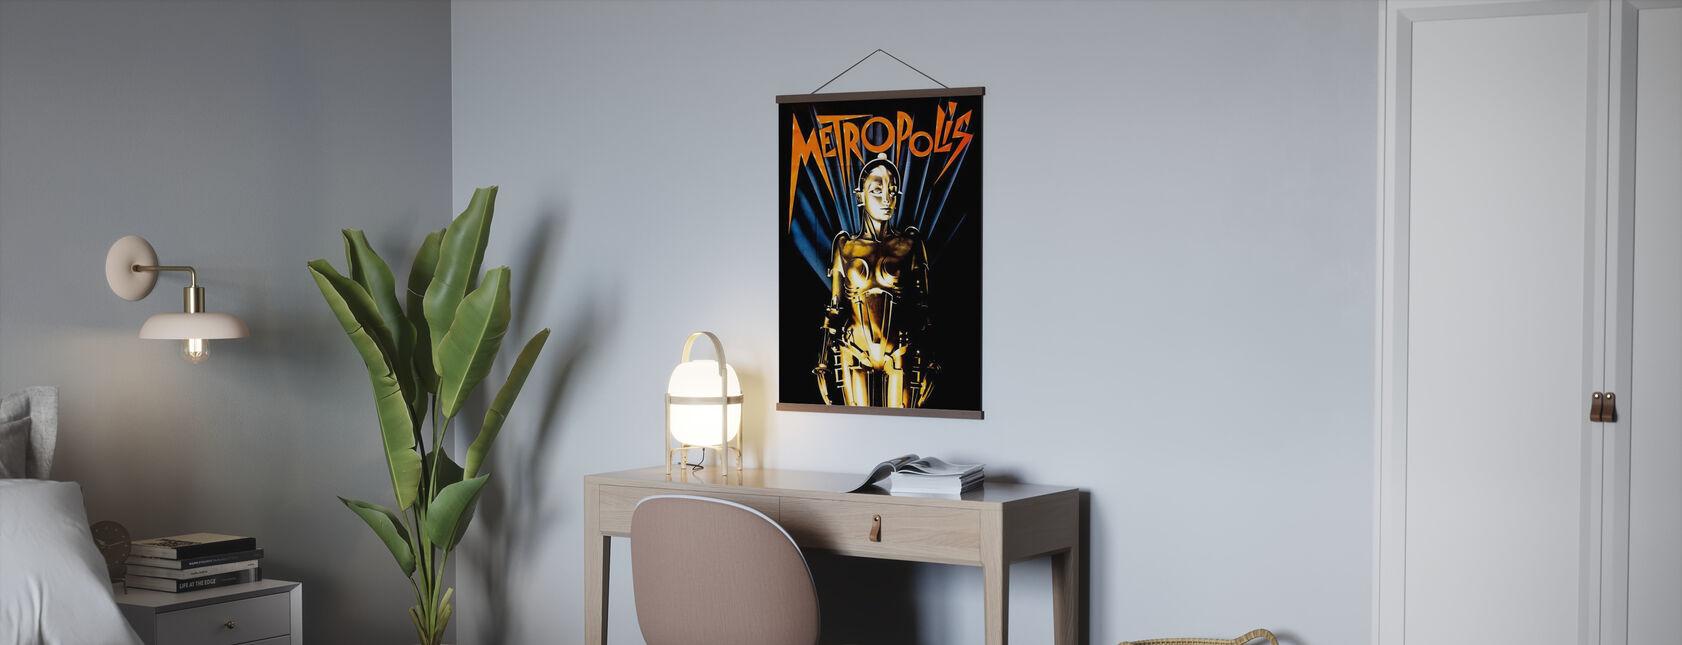 Metropole - Infografiken - Poster - Büro